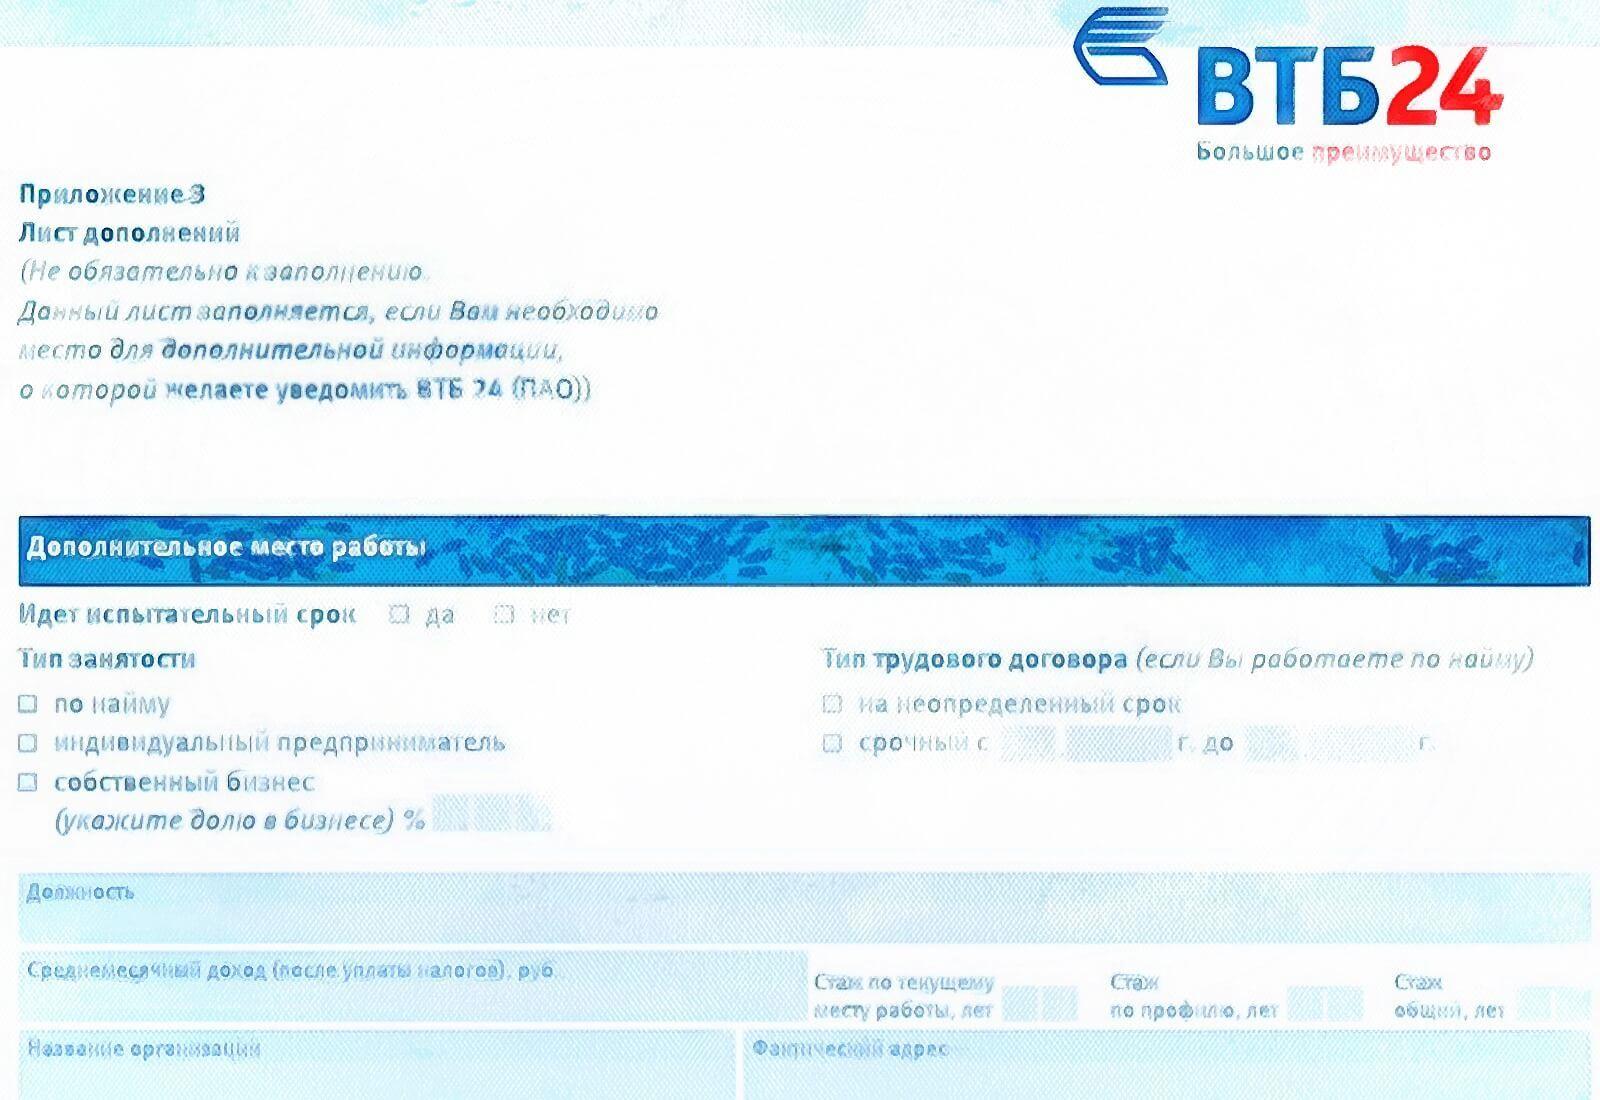 ВТБ 24: анкета на ипотеку и правила заполнения